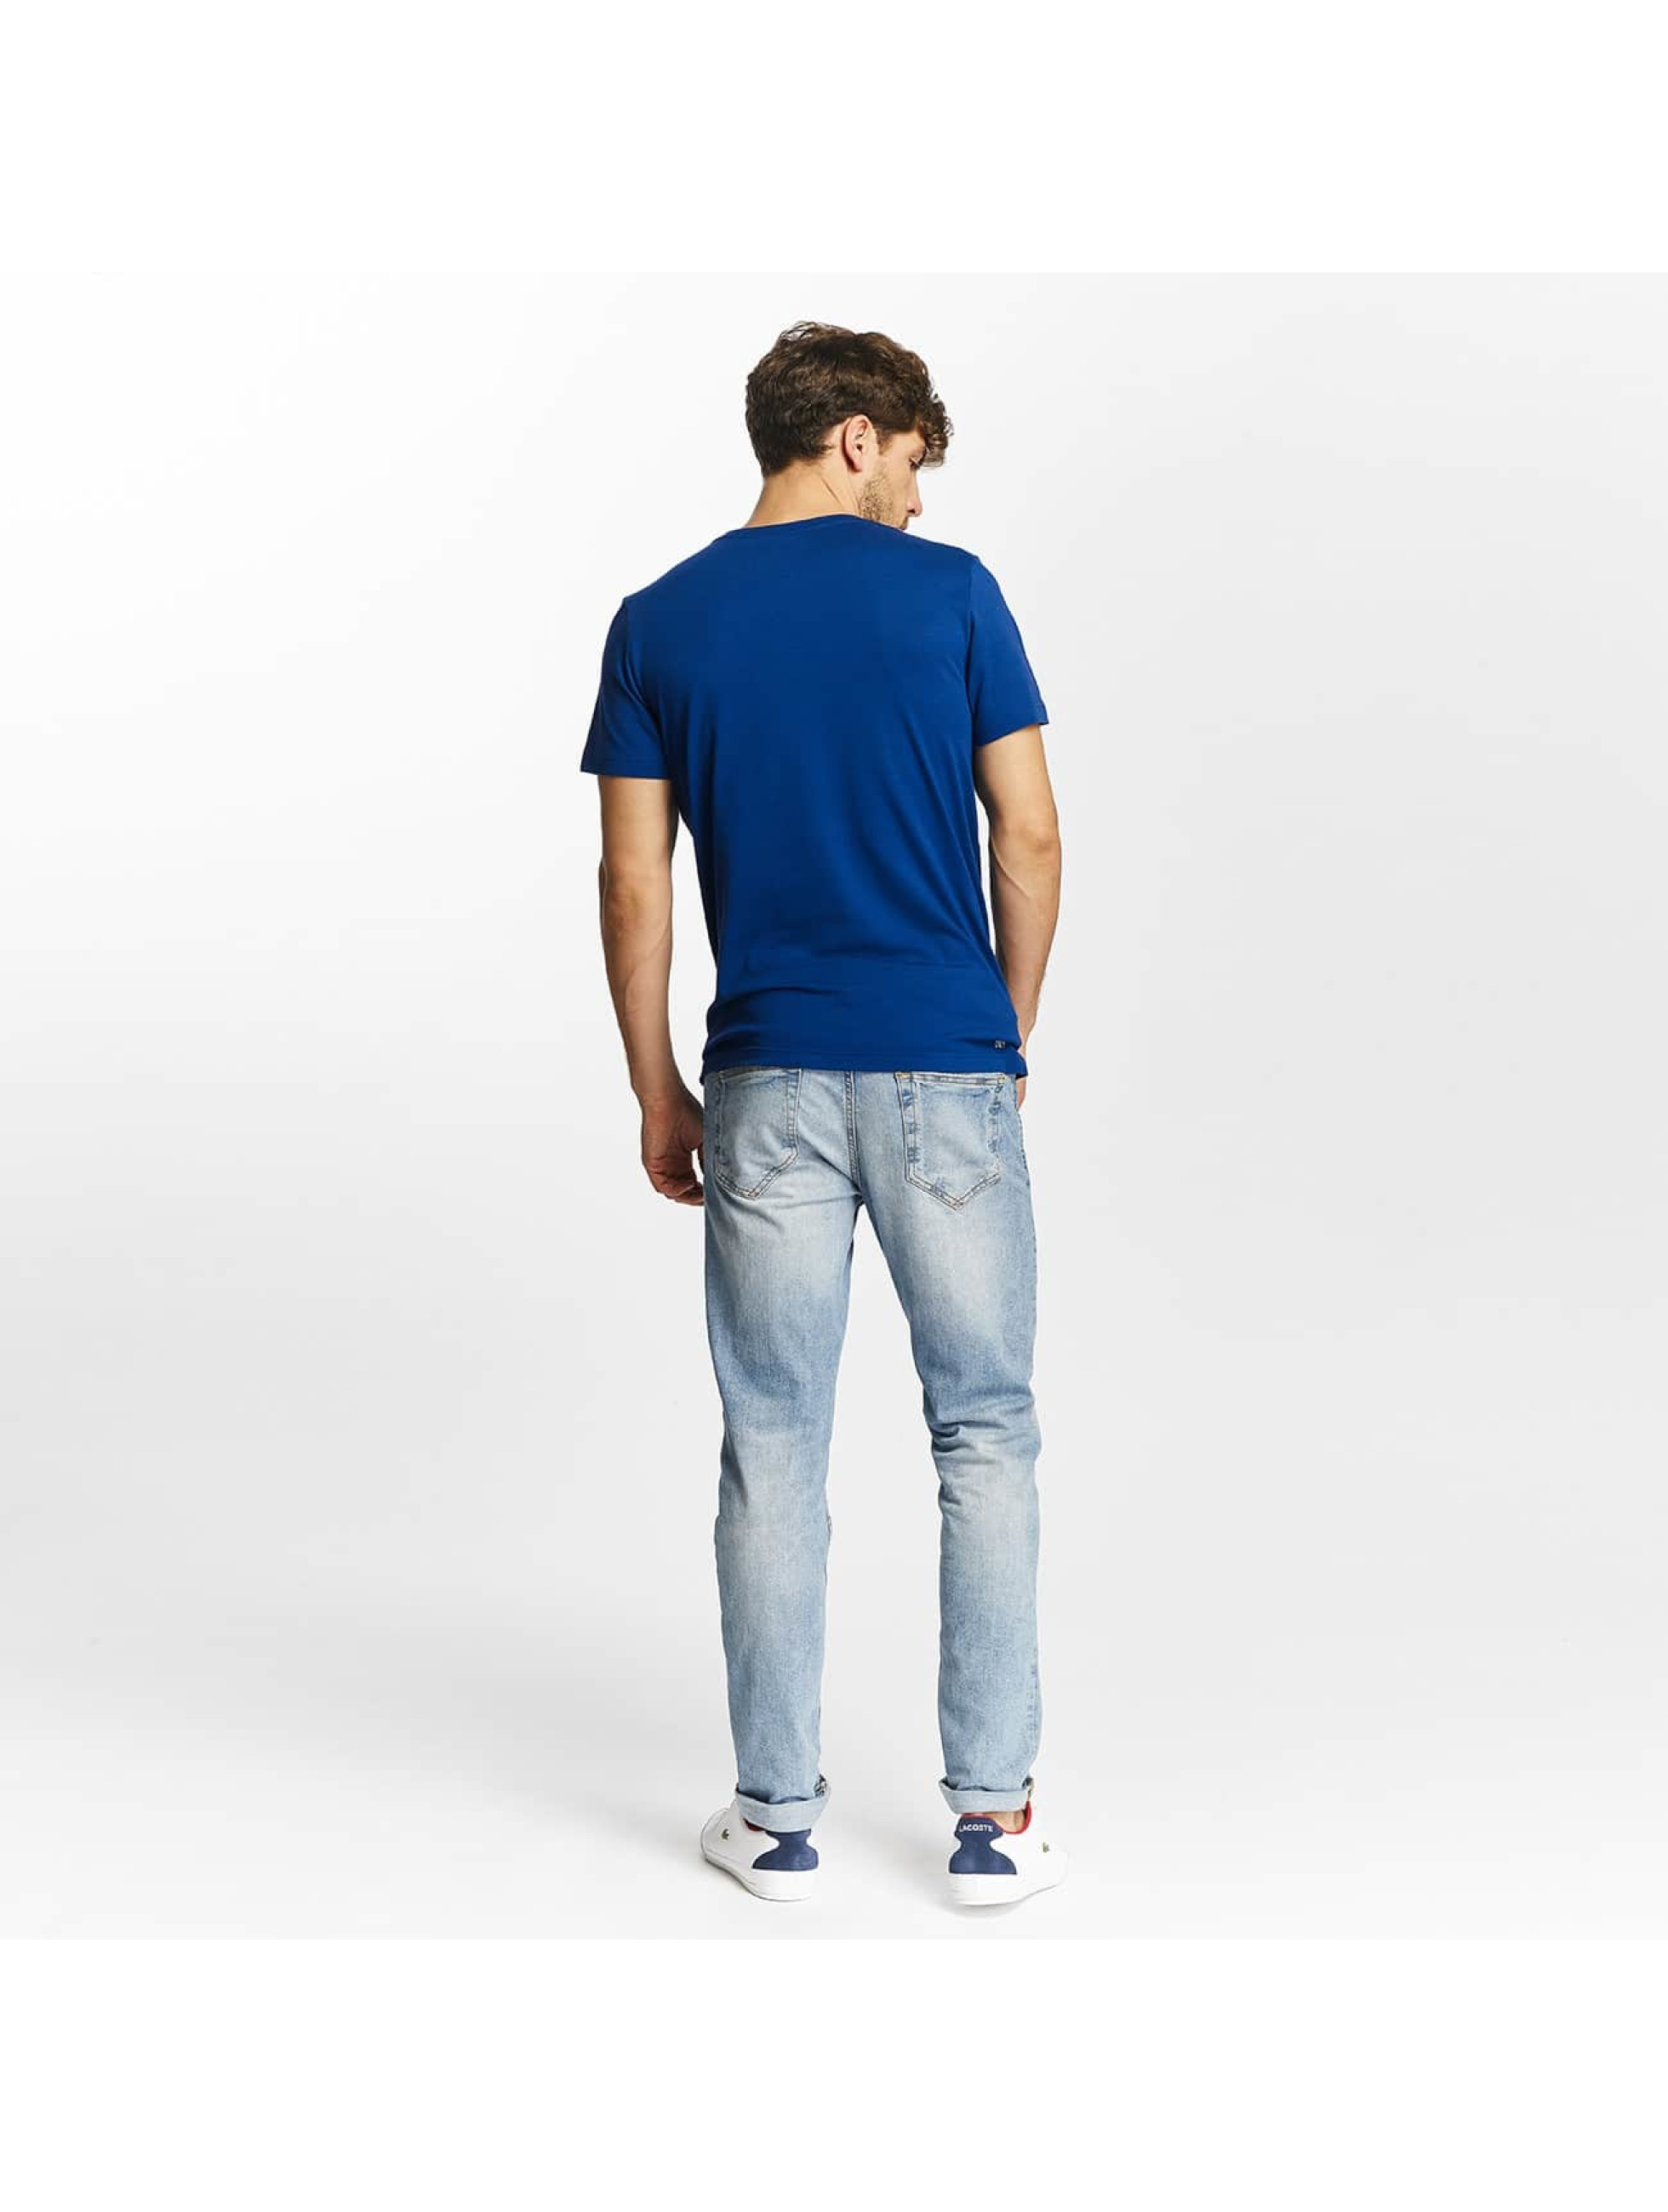 Lacoste Classic T-Shirt Kroko blue